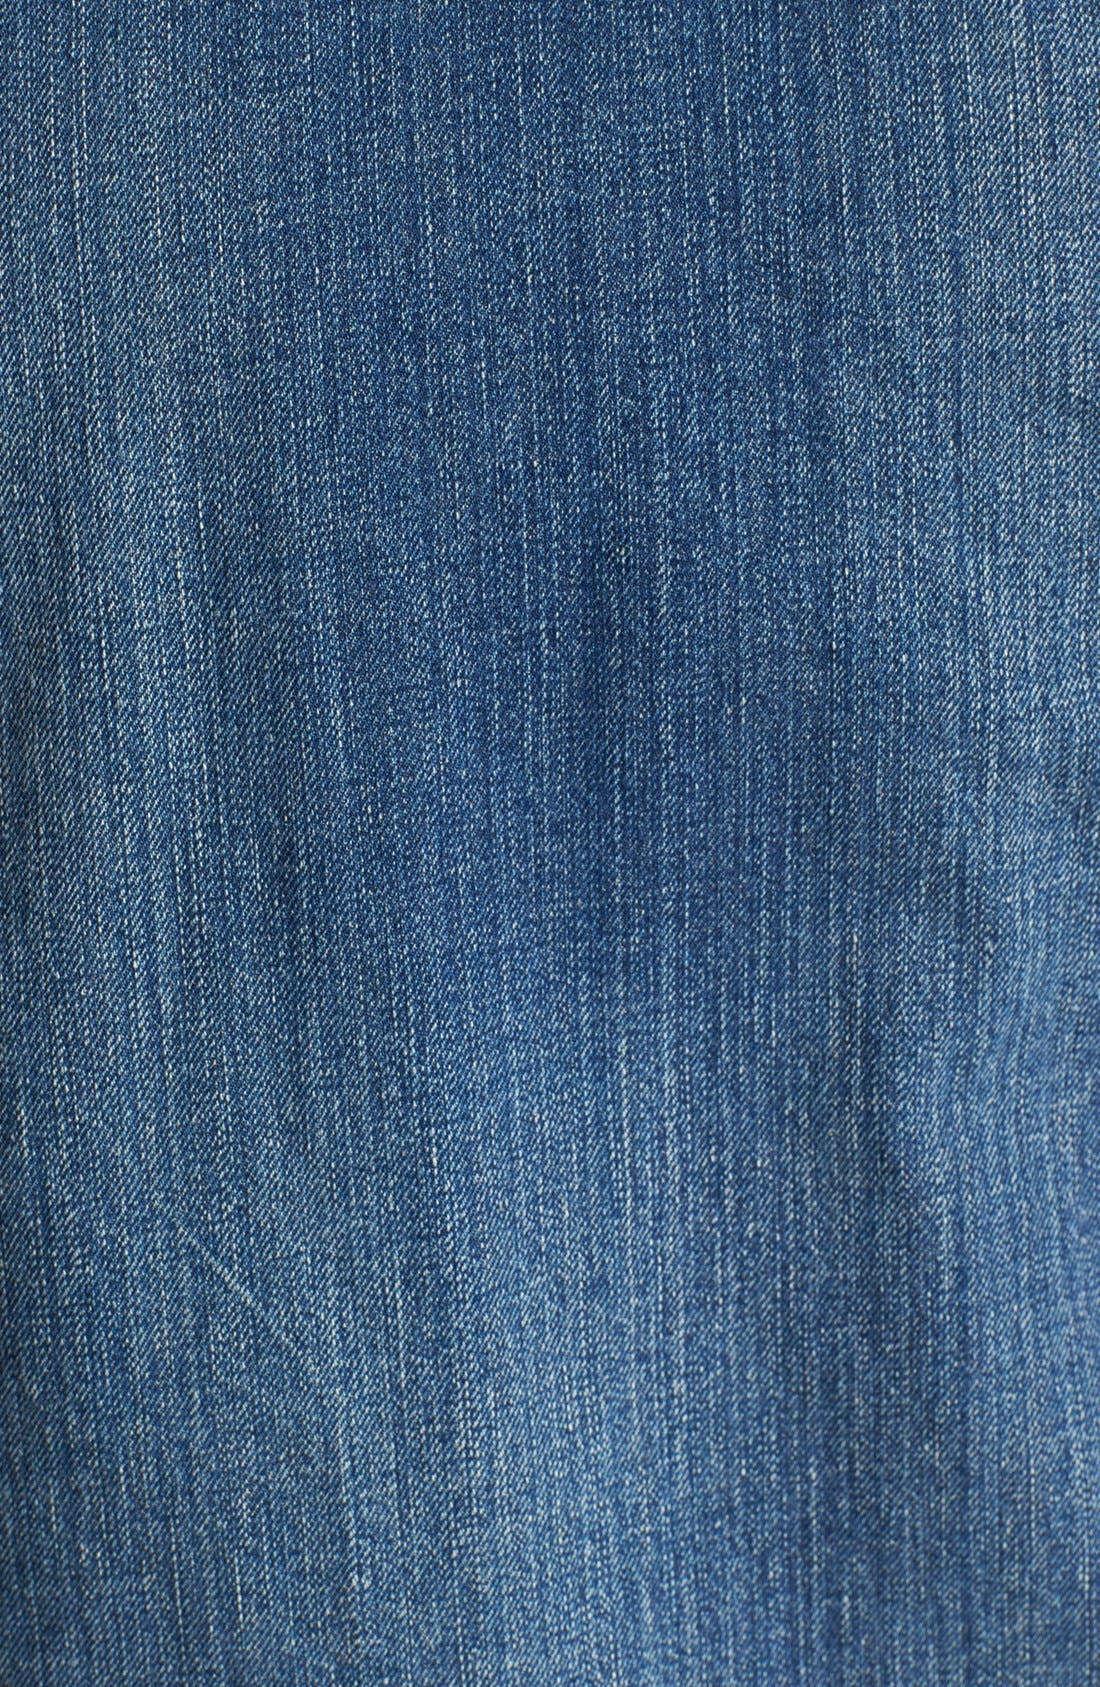 Alternate Image 3  - Scotch & Soda Denim Jacket with Leather Sleeves